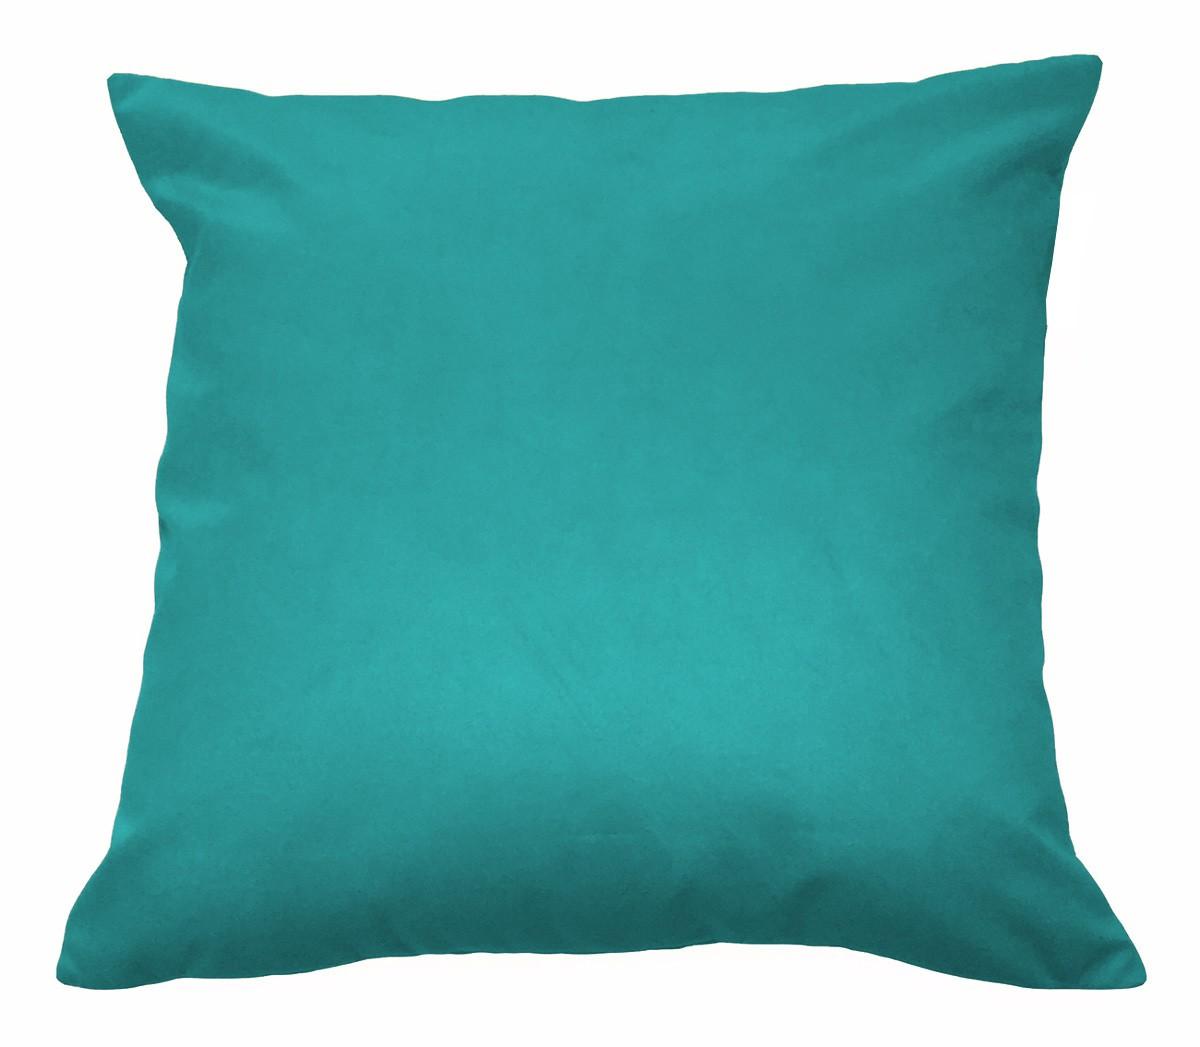 Almofada Decorativa 50x50 Tecido Suede Azul Tiffany